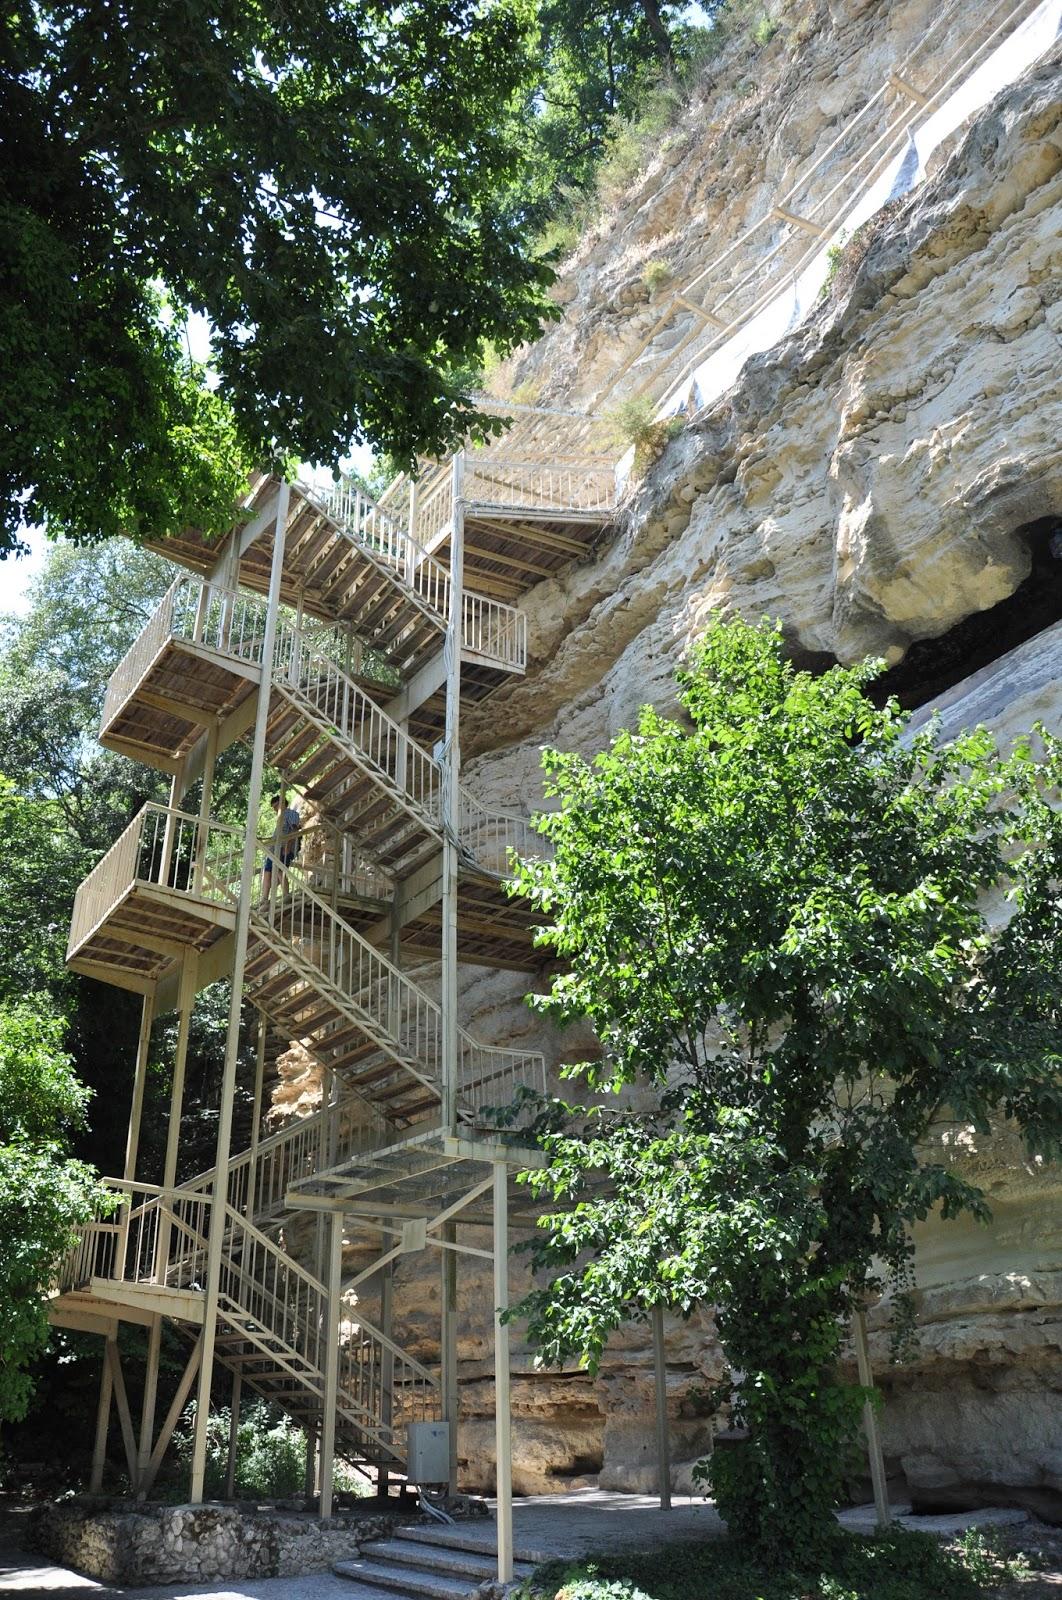 The staircase, Aladzha Monastery, Varna, Bulgaria